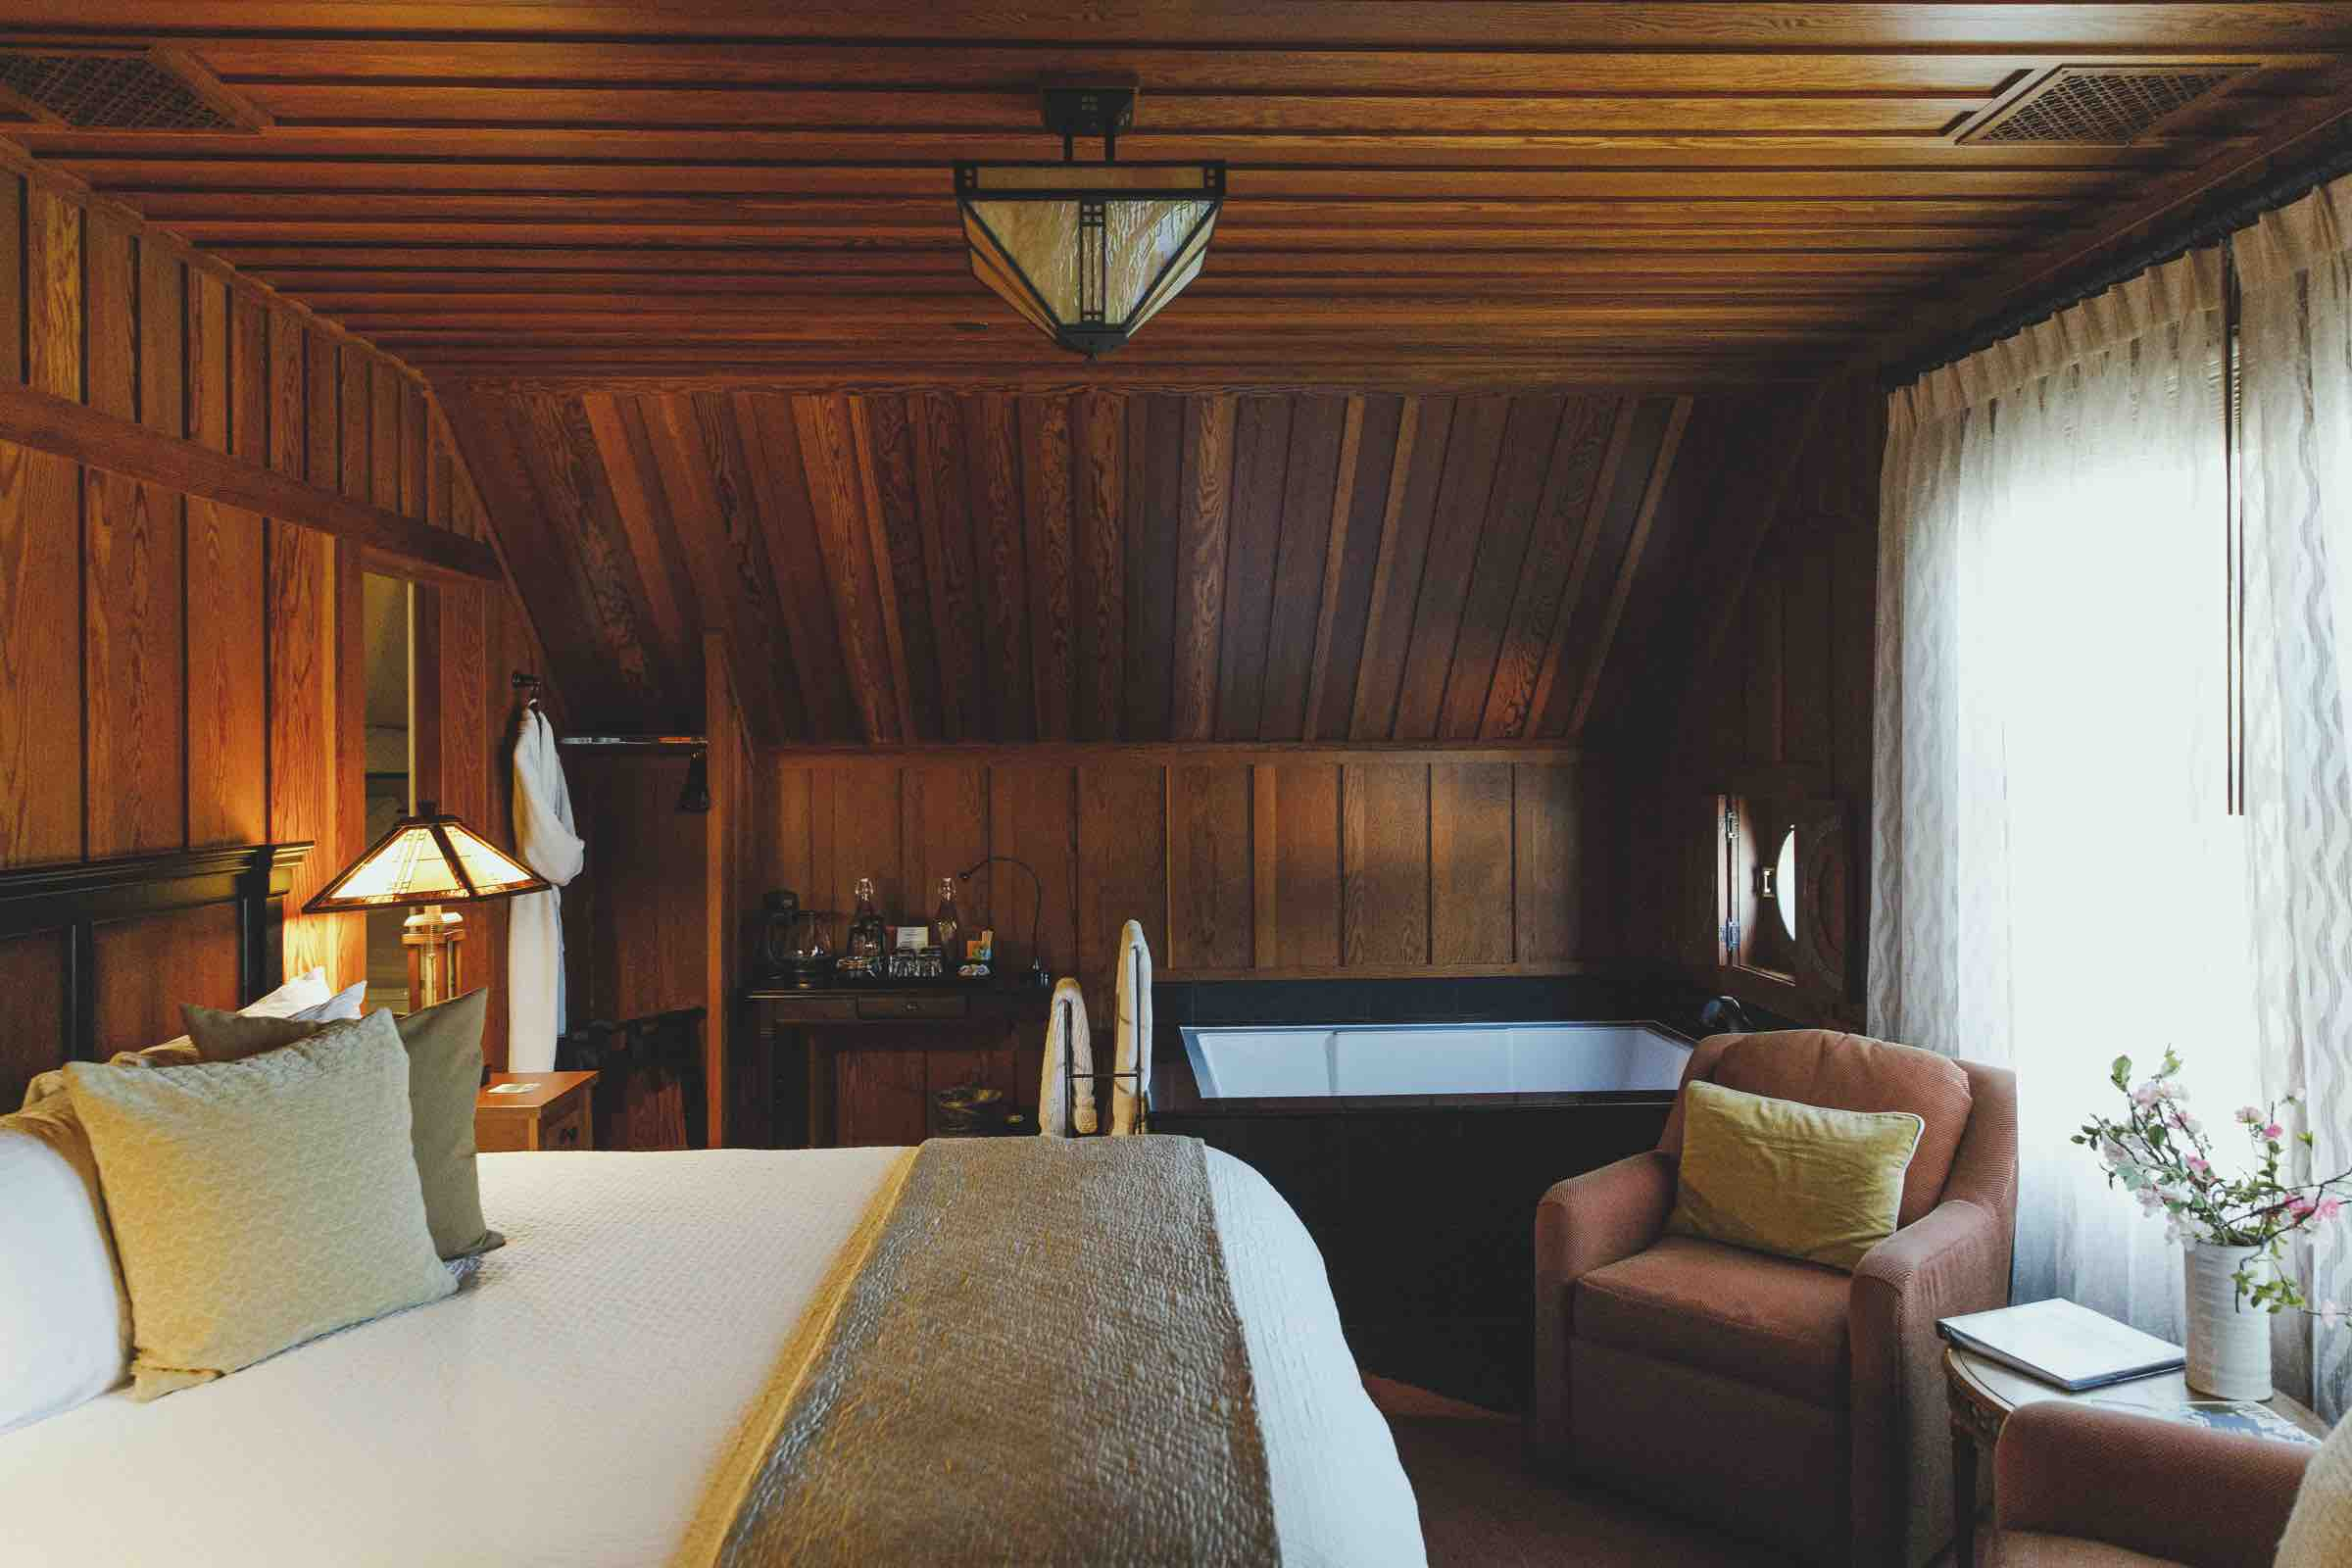 Bedroom with bathtub at Noyo Harbor Inn